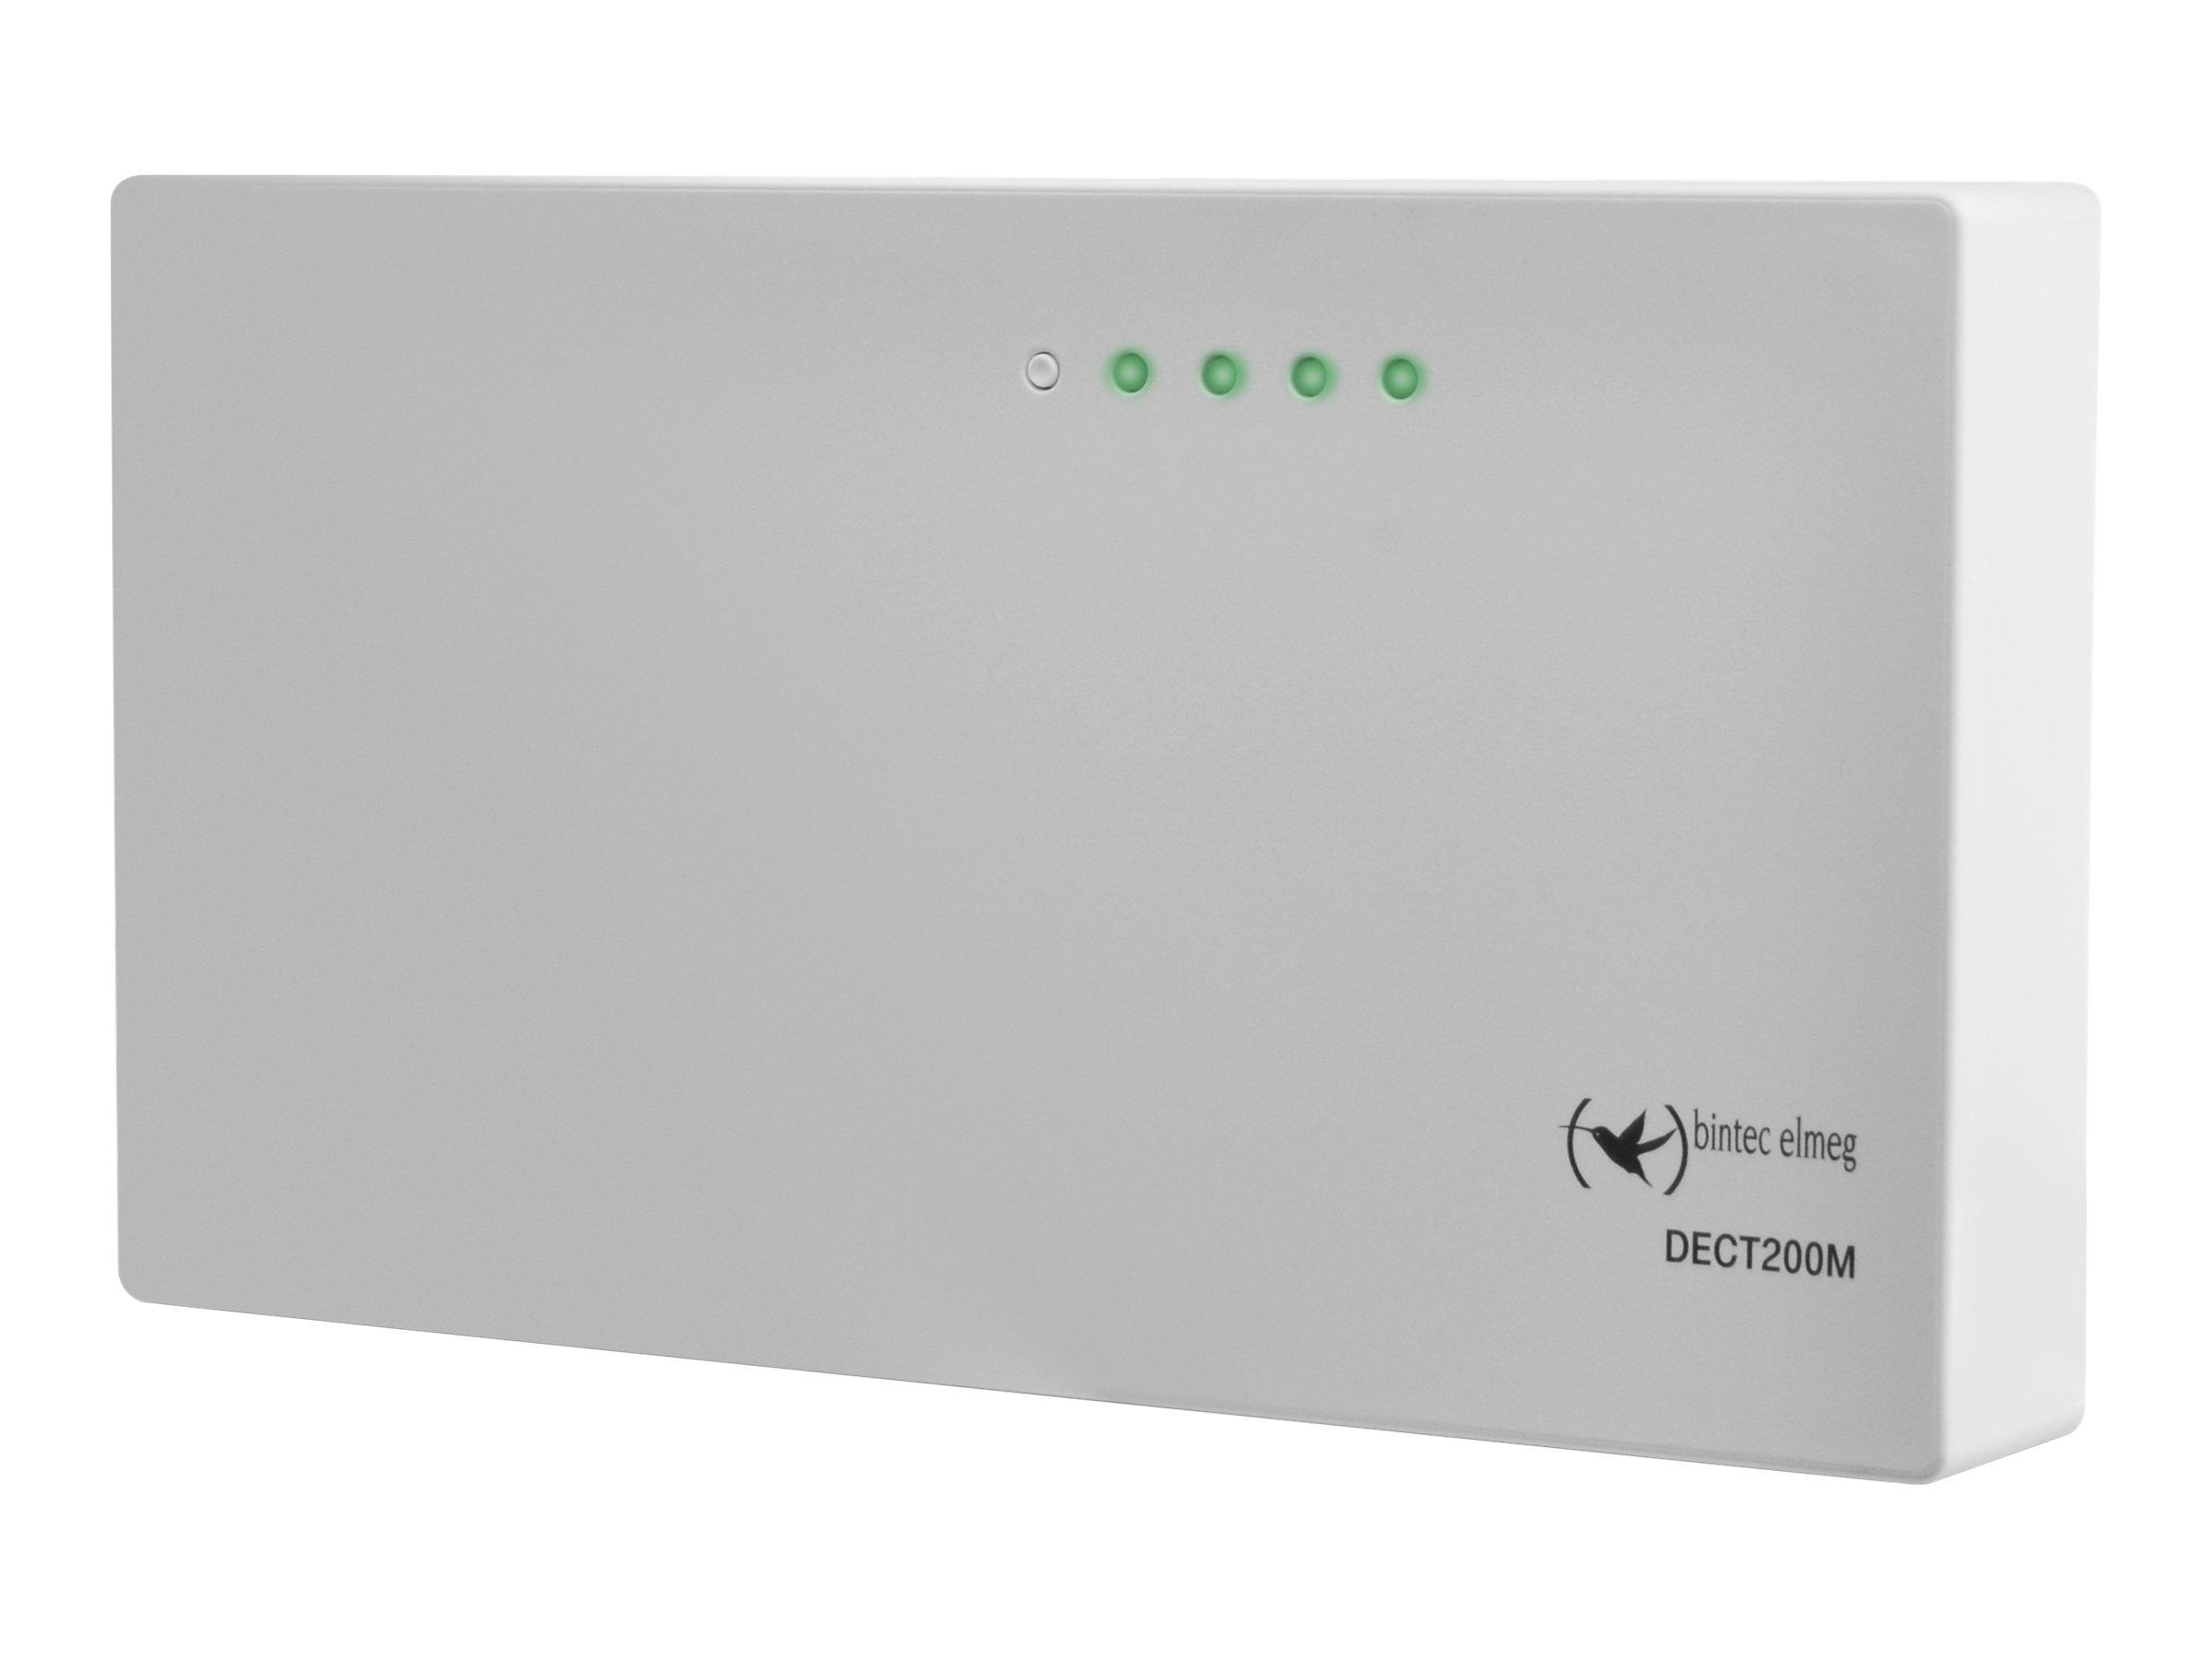 elmeg DECT200M - Basisstation für kabelloses VoIP-Telefon - 100Mb LAN